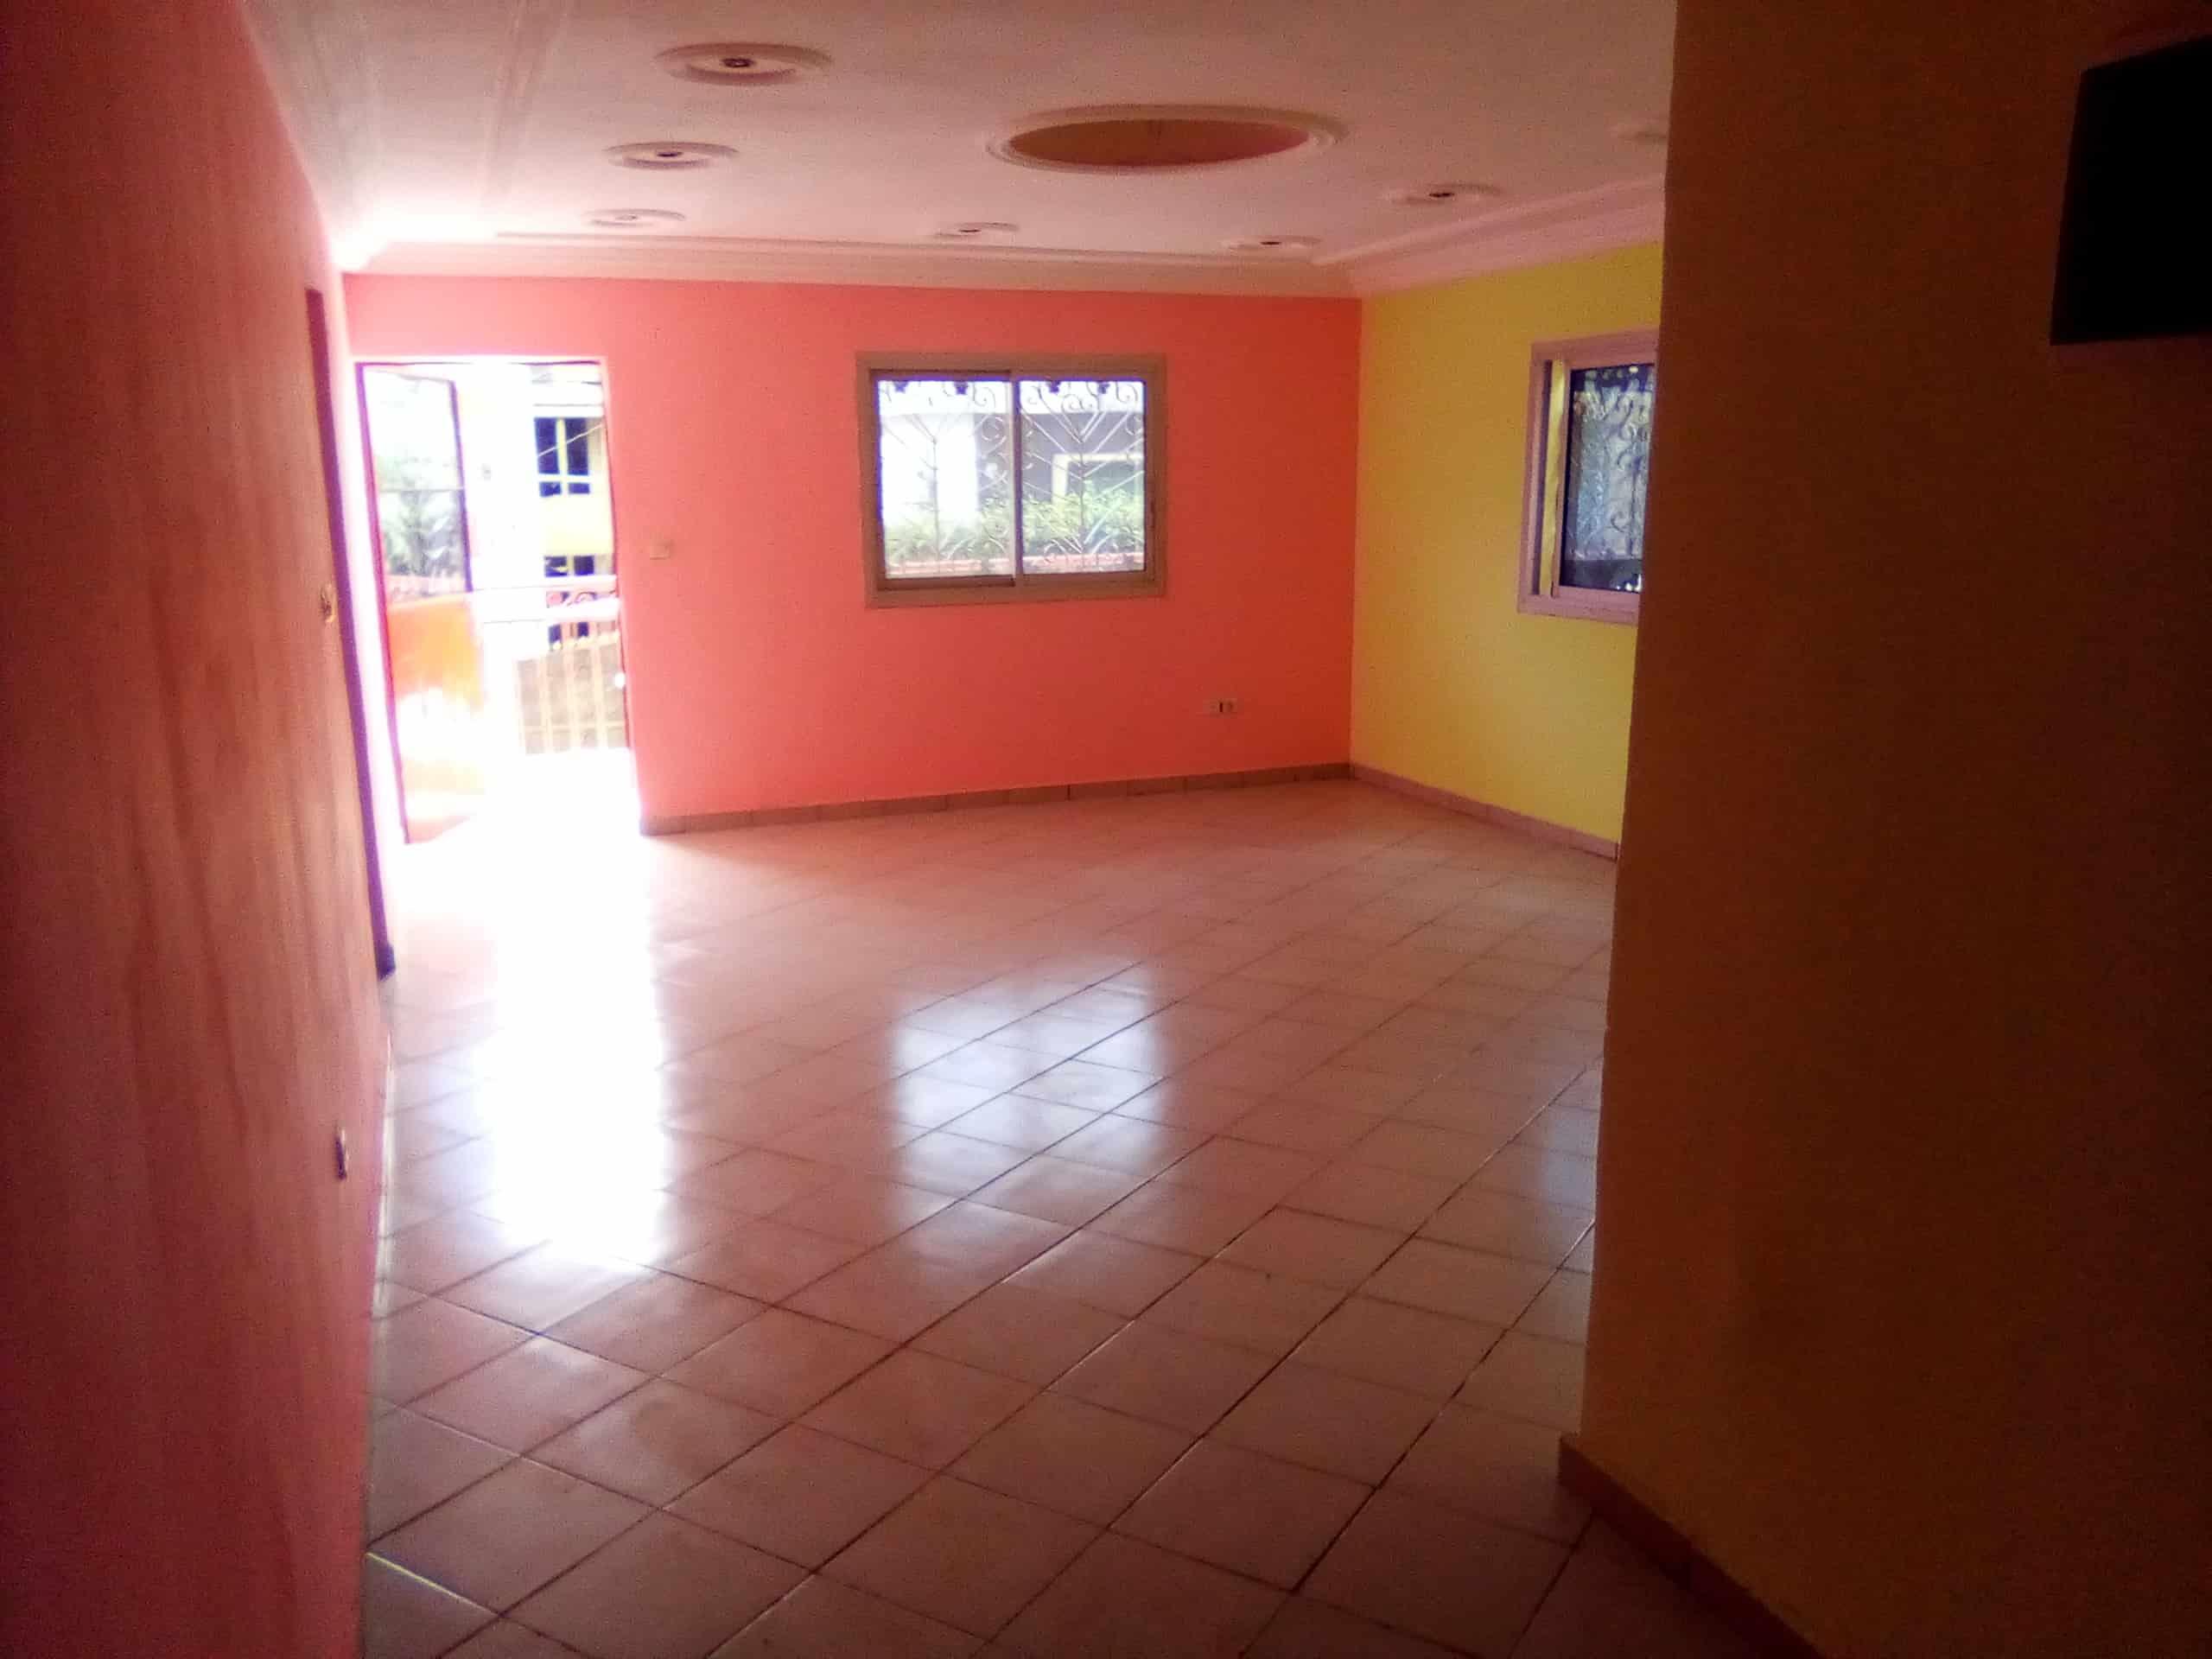 Apartment to rent - Douala, Makepe, bm - 1 living room(s), 2 bedroom(s), 1 bathroom(s) - 100 000 FCFA / month